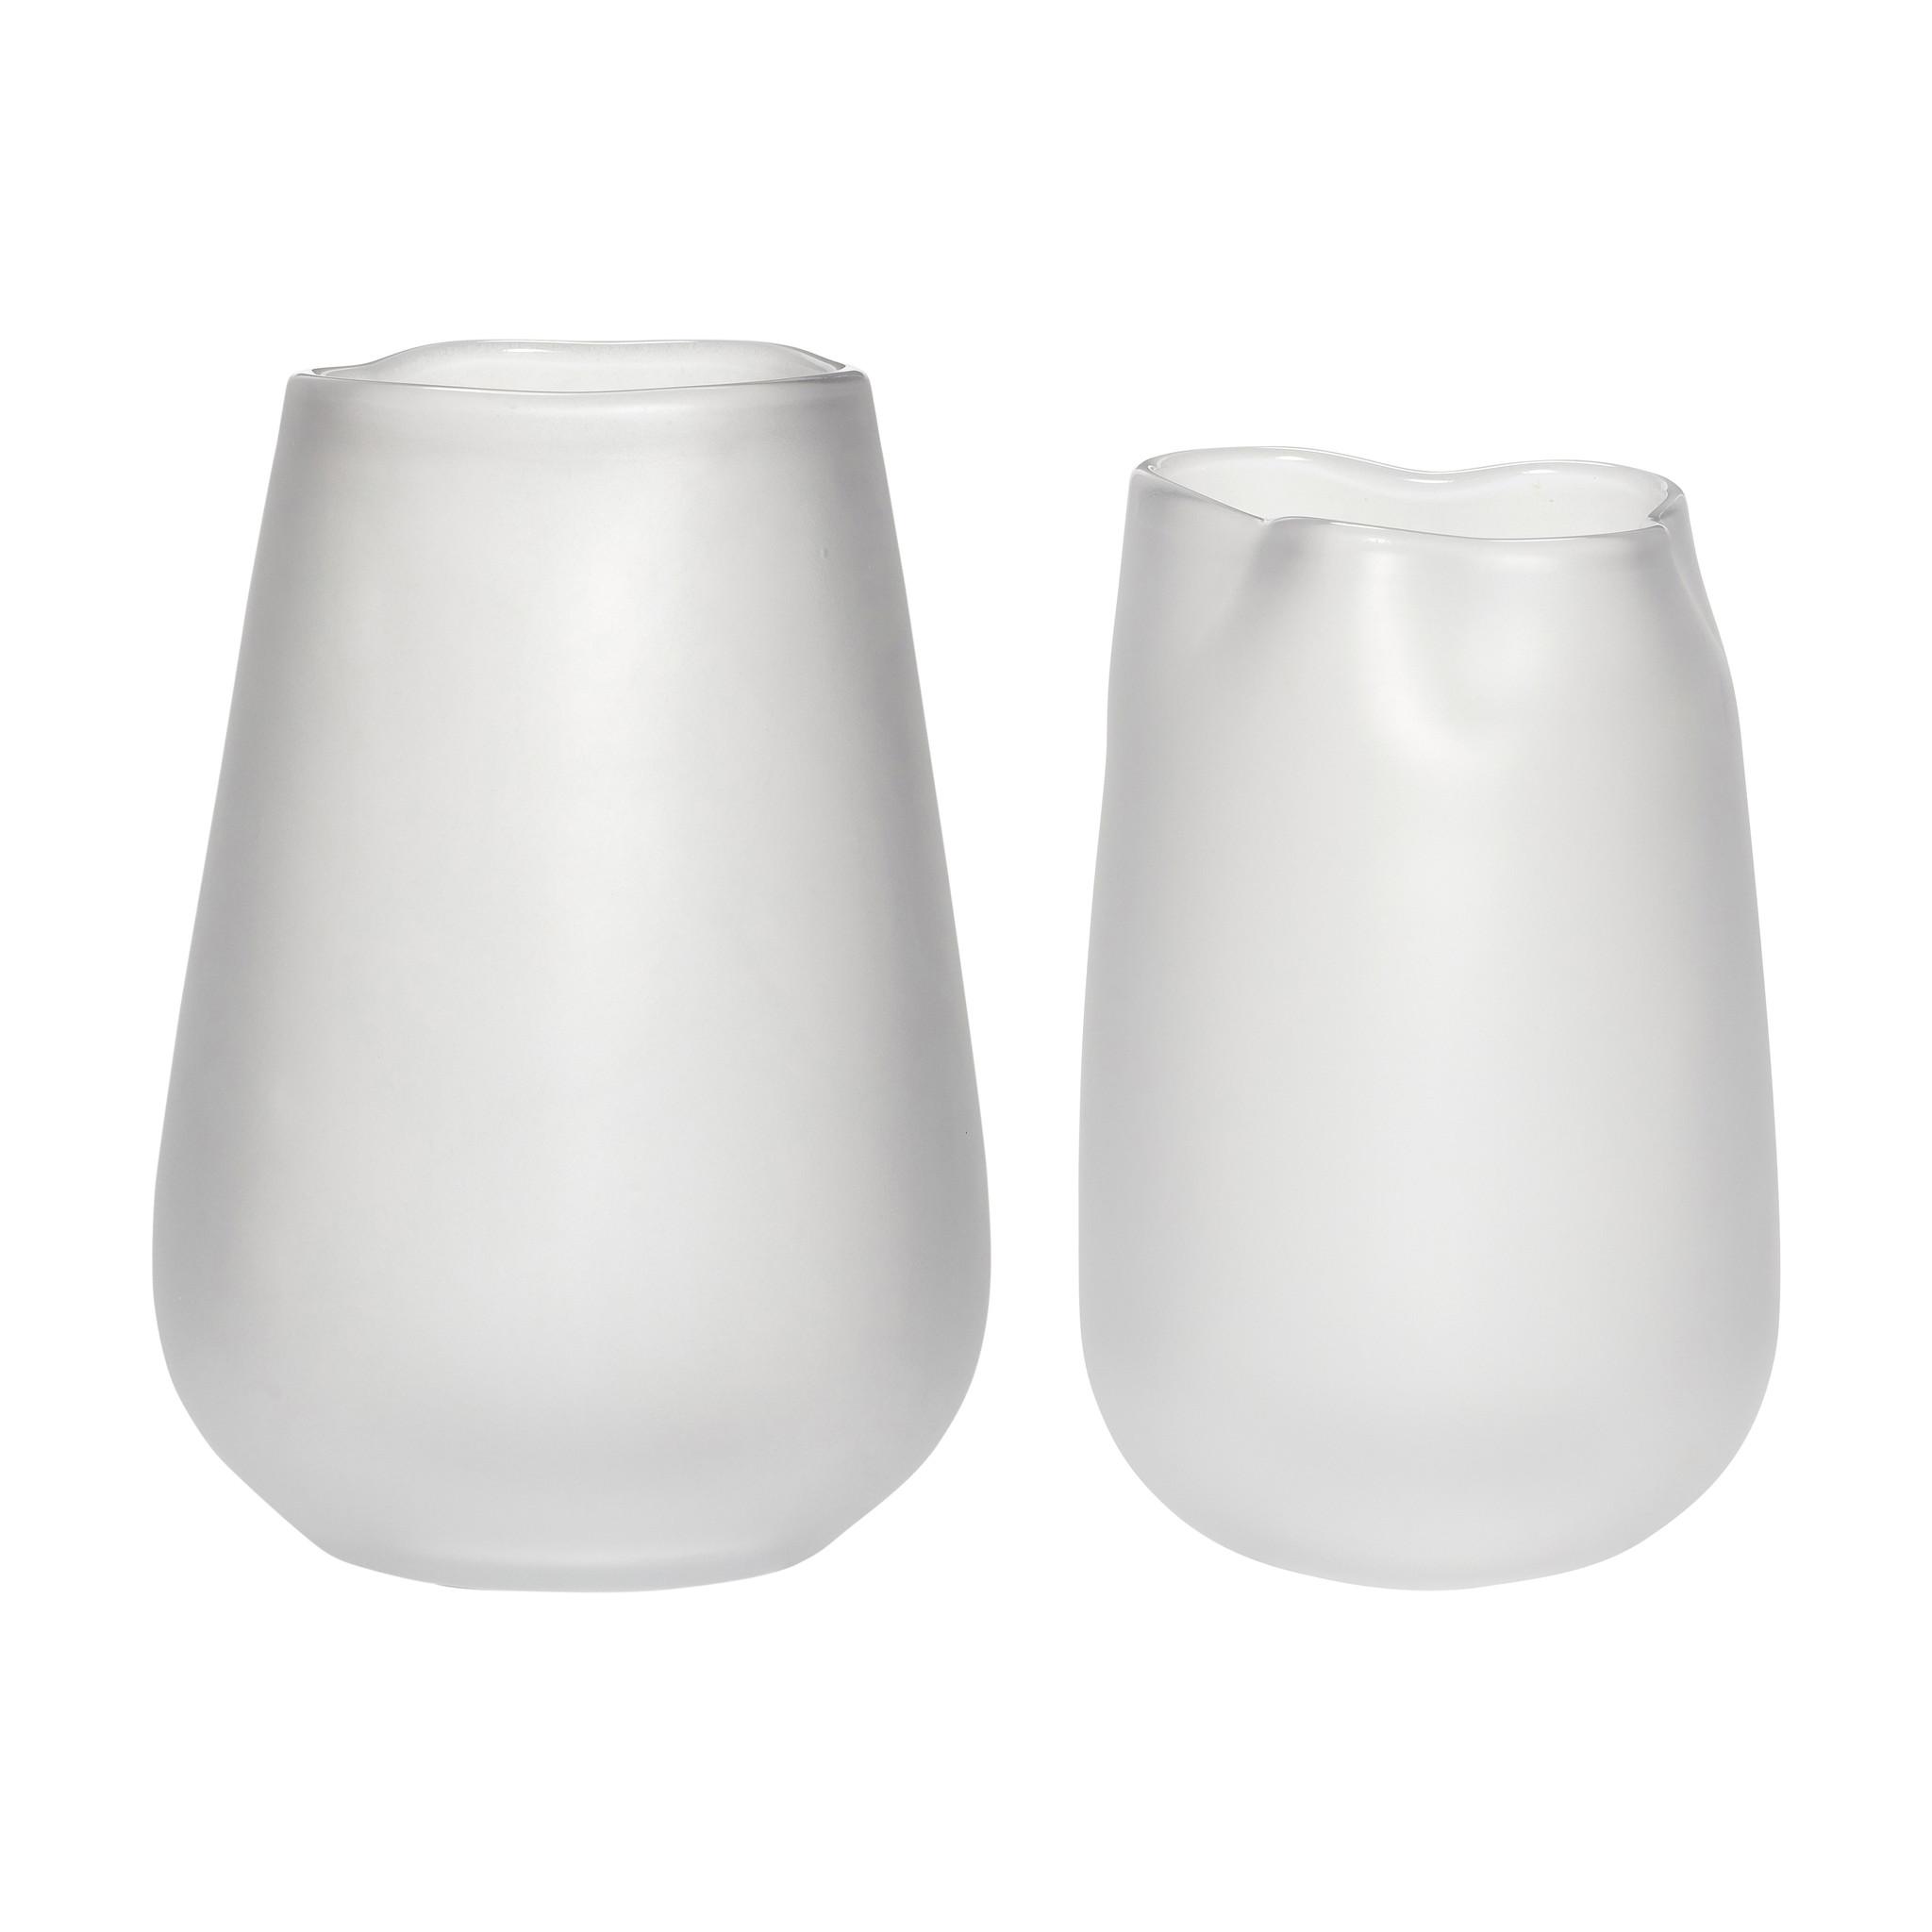 Hubsch Vaas, glas, wit, set van 2